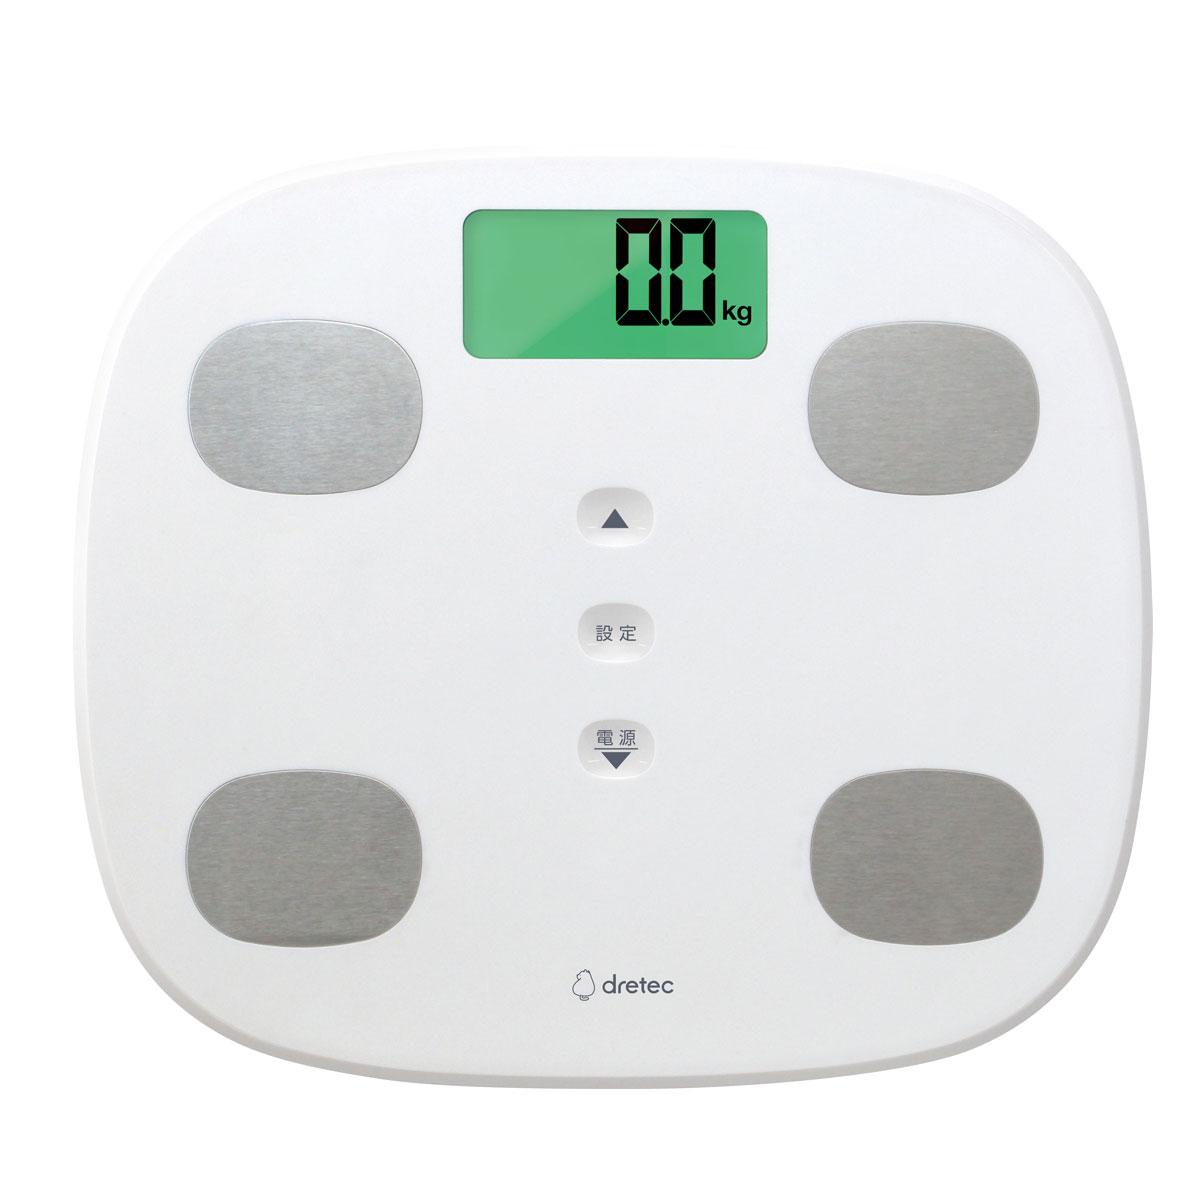 dretec(ドリテック)体重体組成計 レイズ BS-246